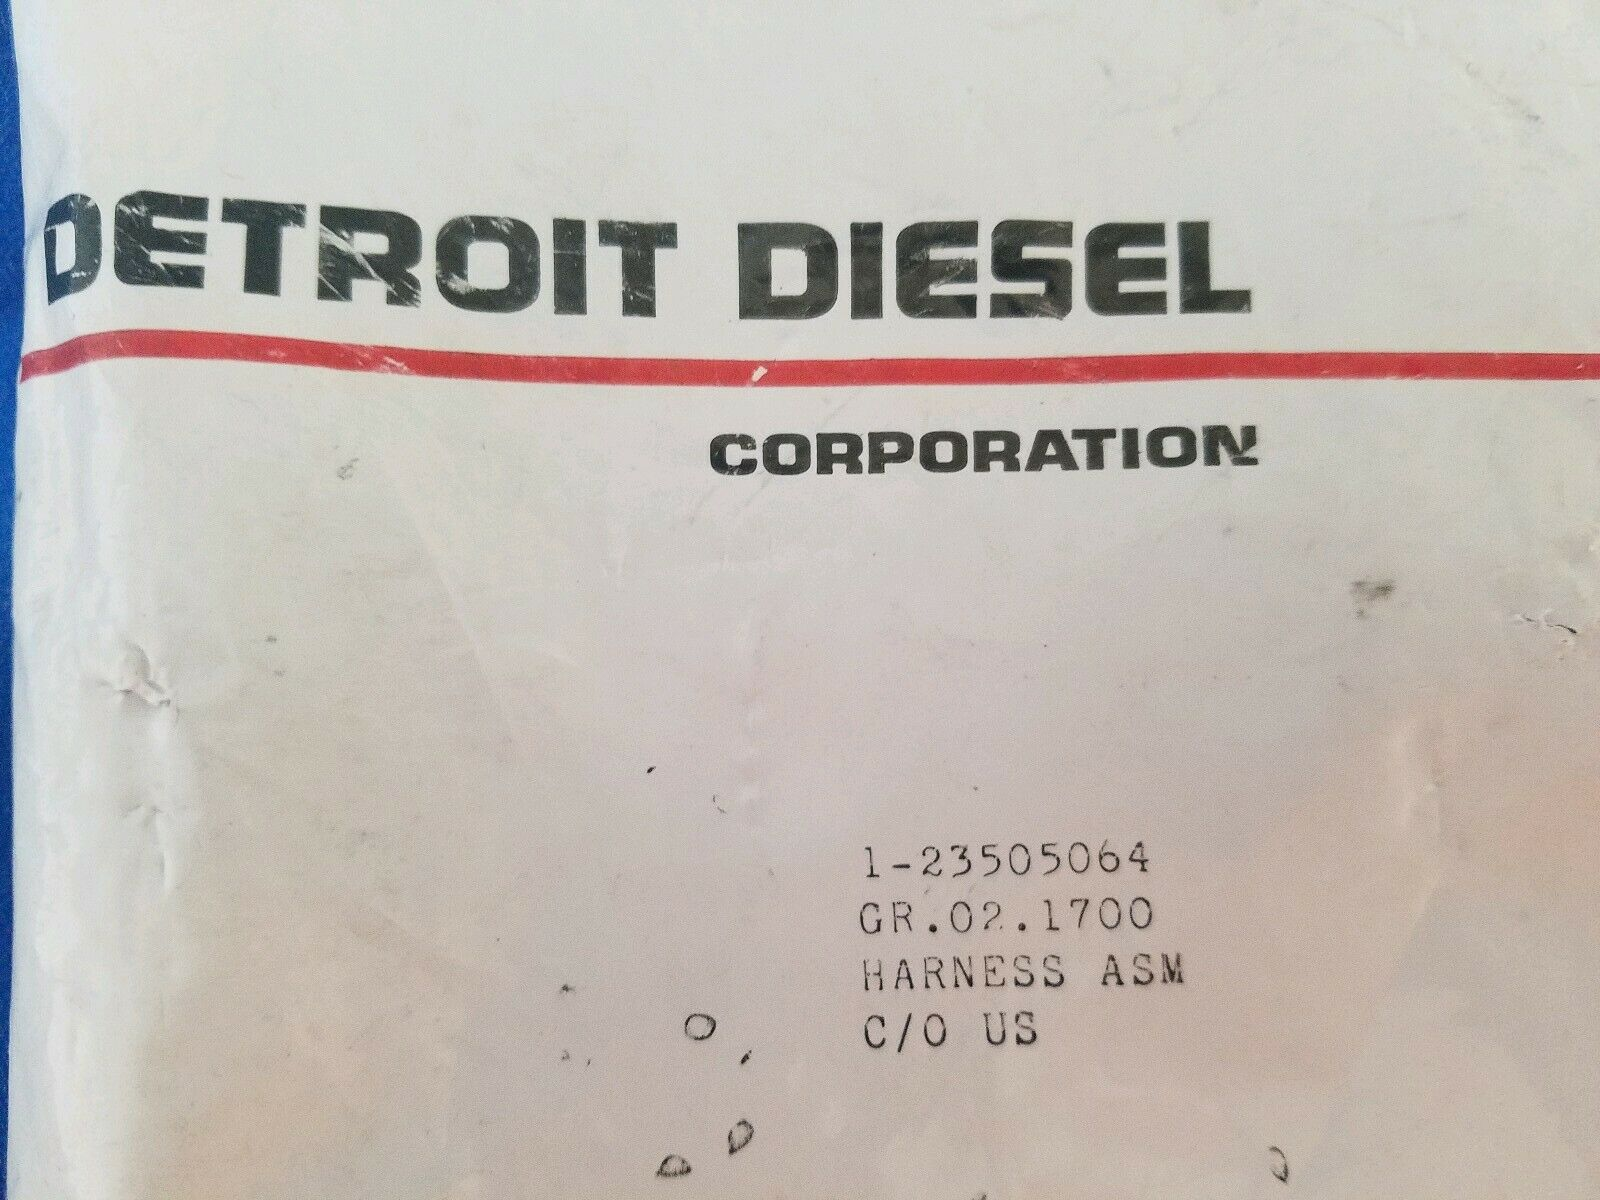 GR-2.1700 P//N 23505064 DETROIT DIESEL LEFT BANK INJECTOR HARNESS ASSEMBLY